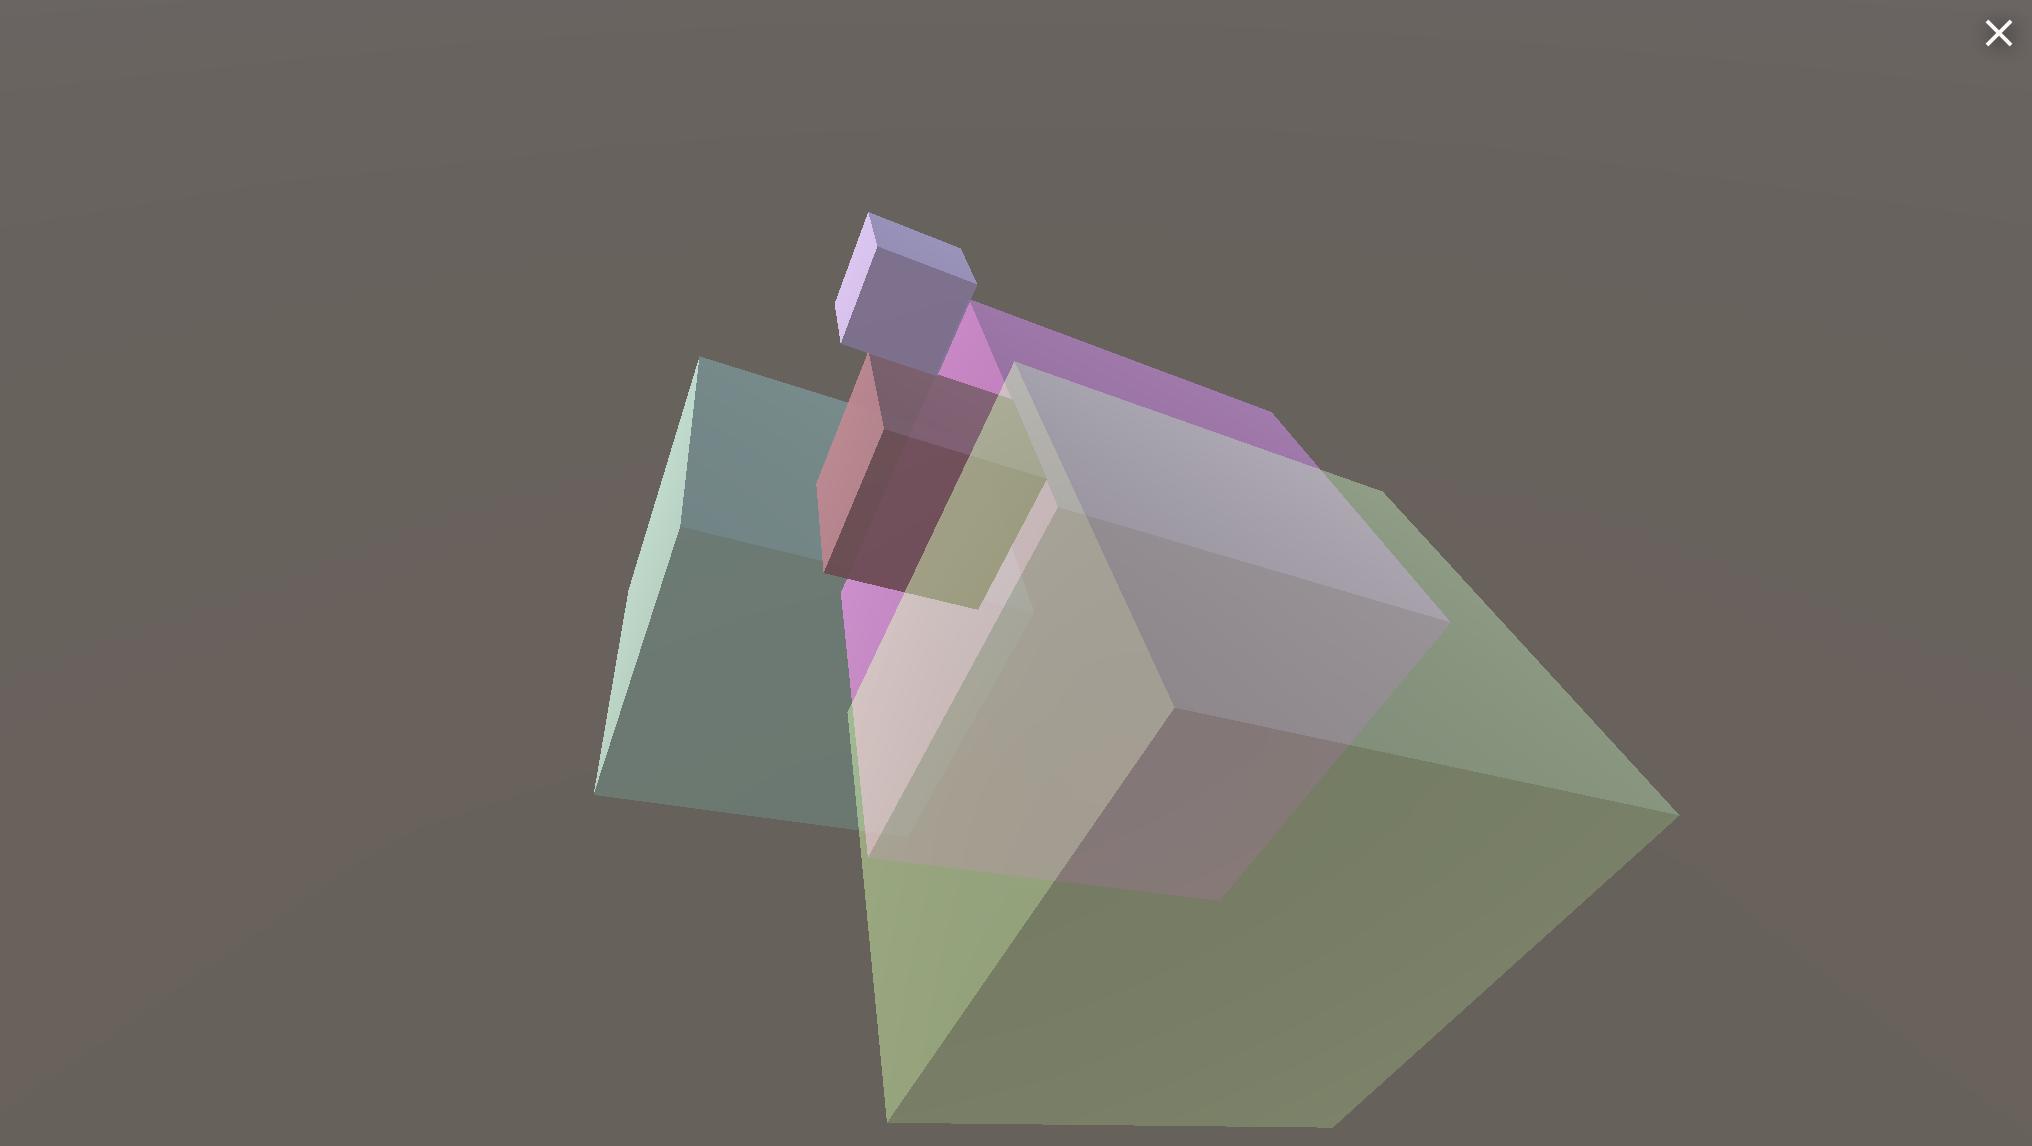 Jael's mod the cube